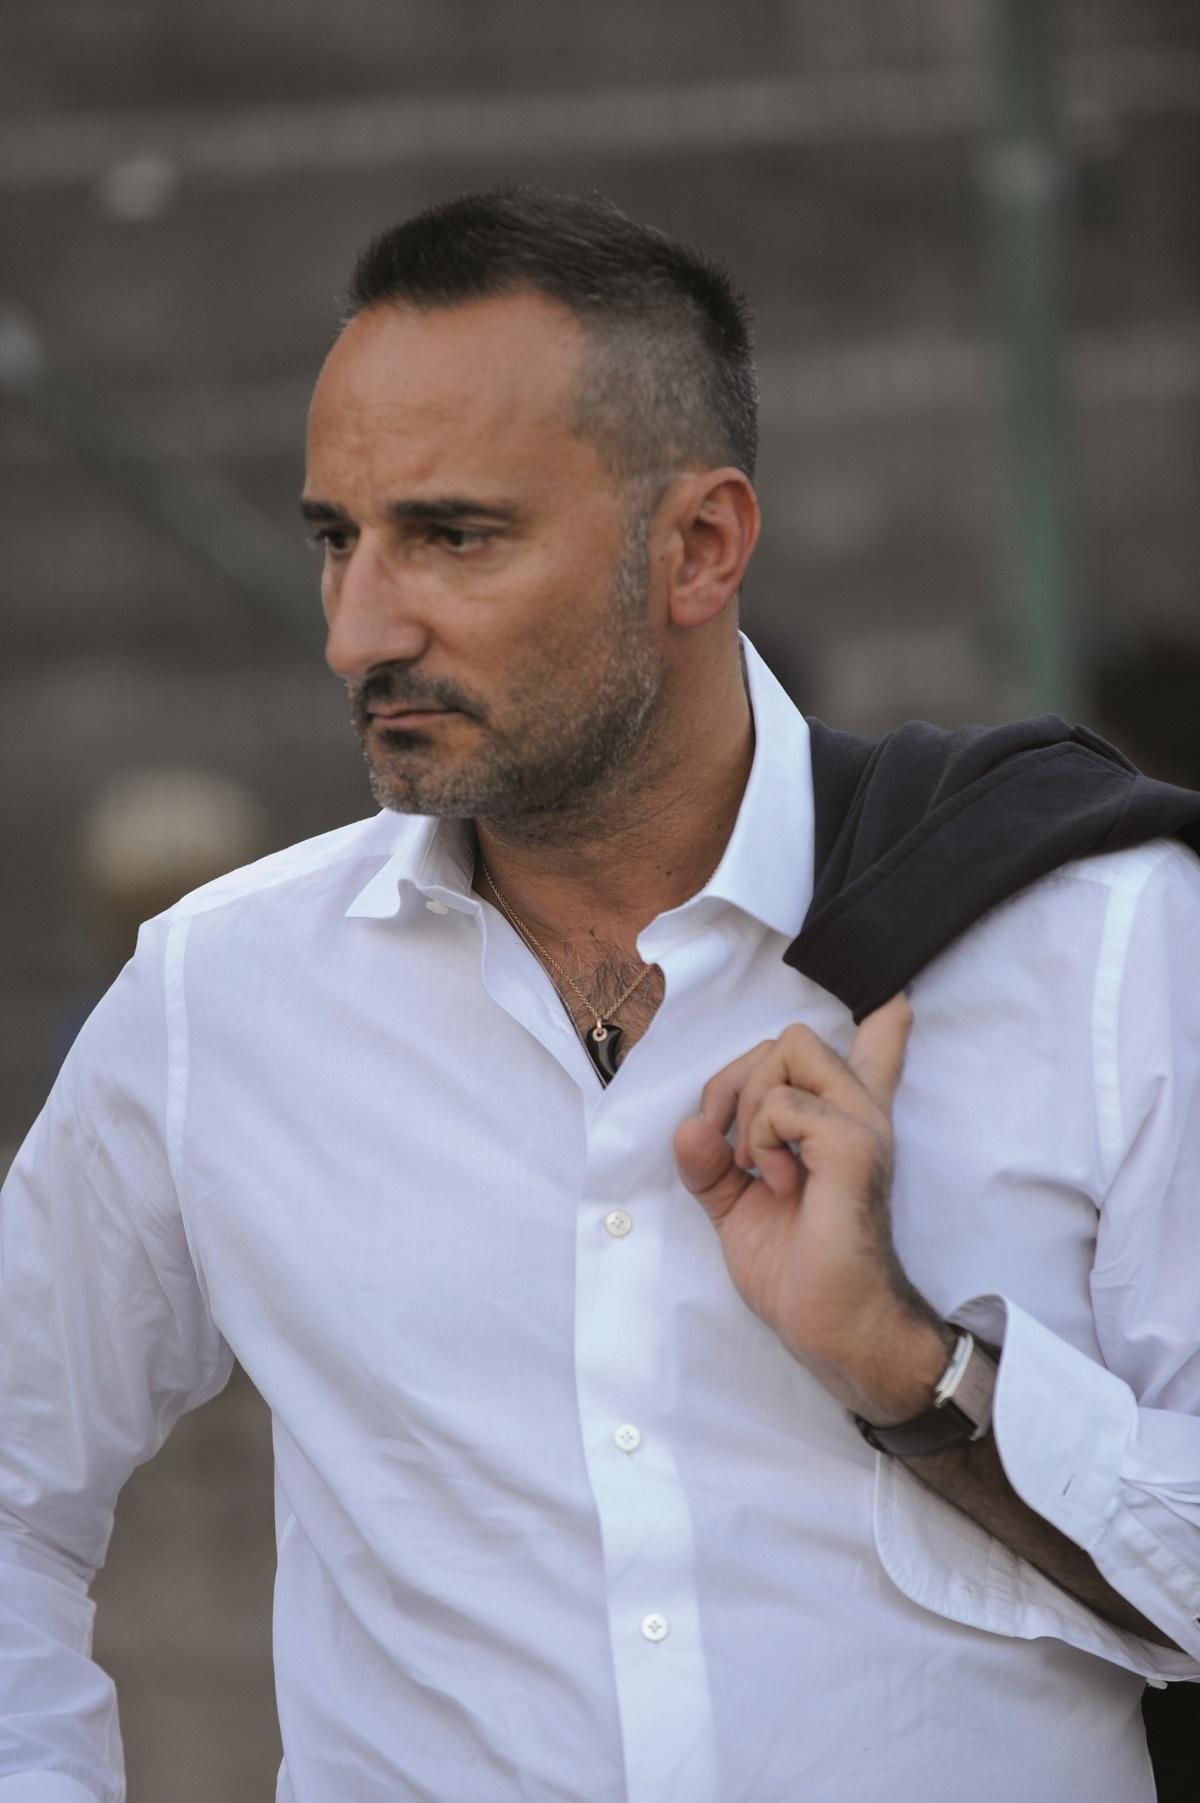 Maurizio-Setti-Ceo-Antress-Induustry-Spa